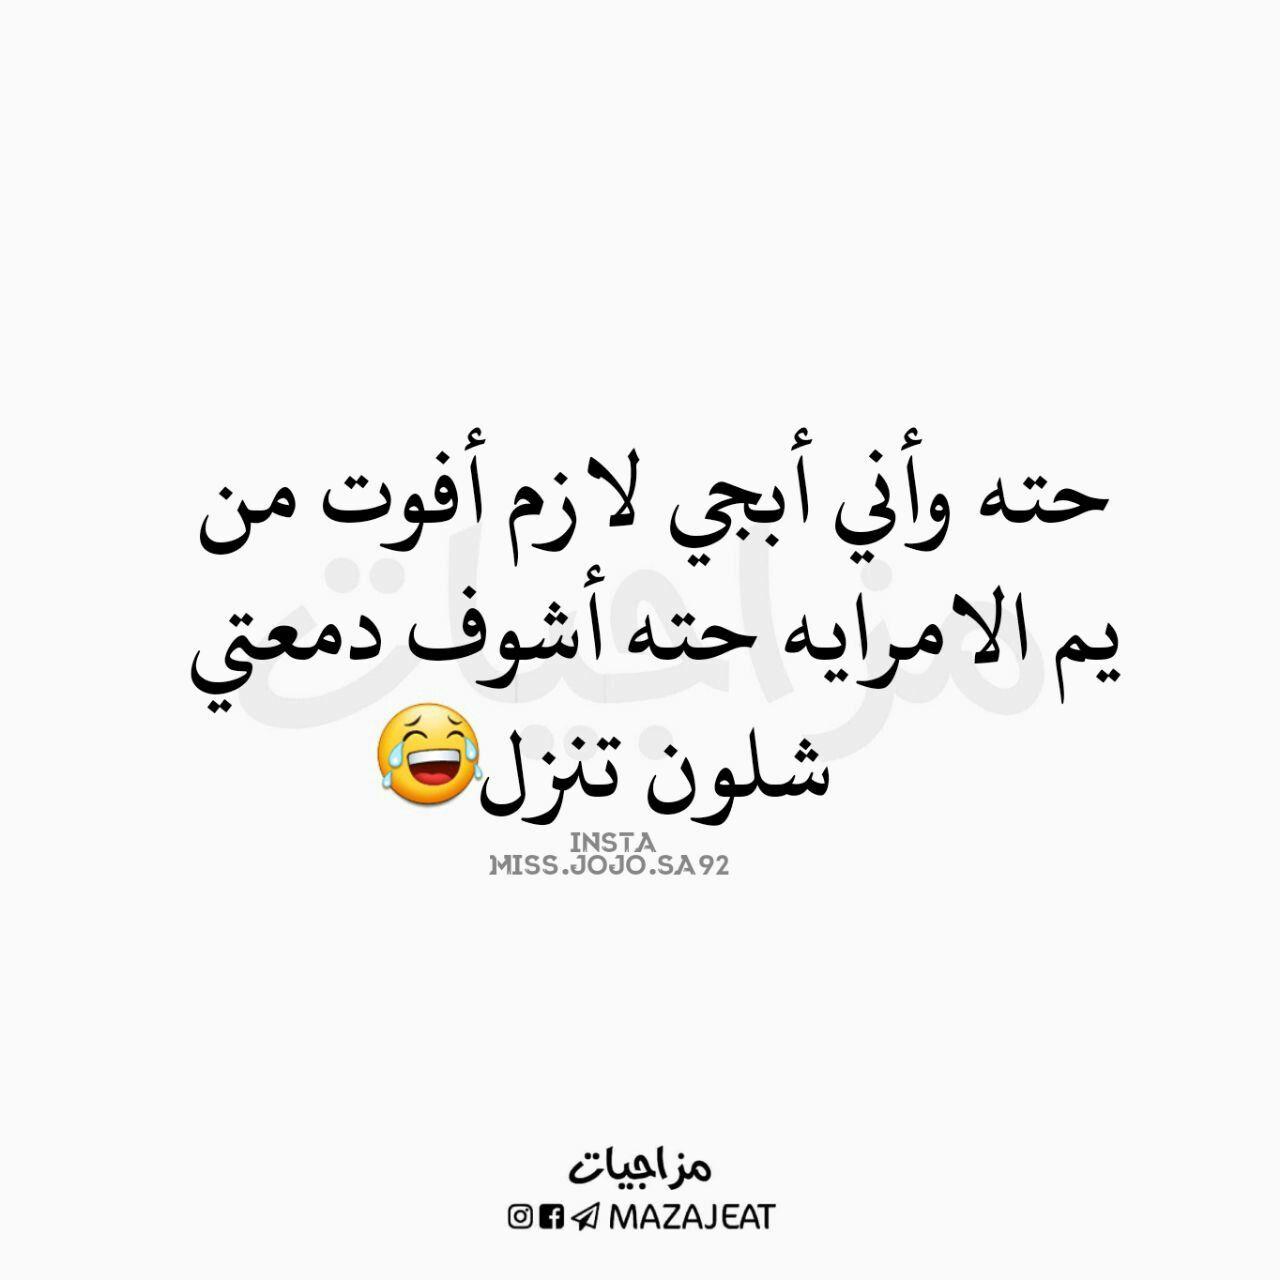 Pin By Meme Al Samrea Meme Al Samrea On ضحك و فرفشة Laughing